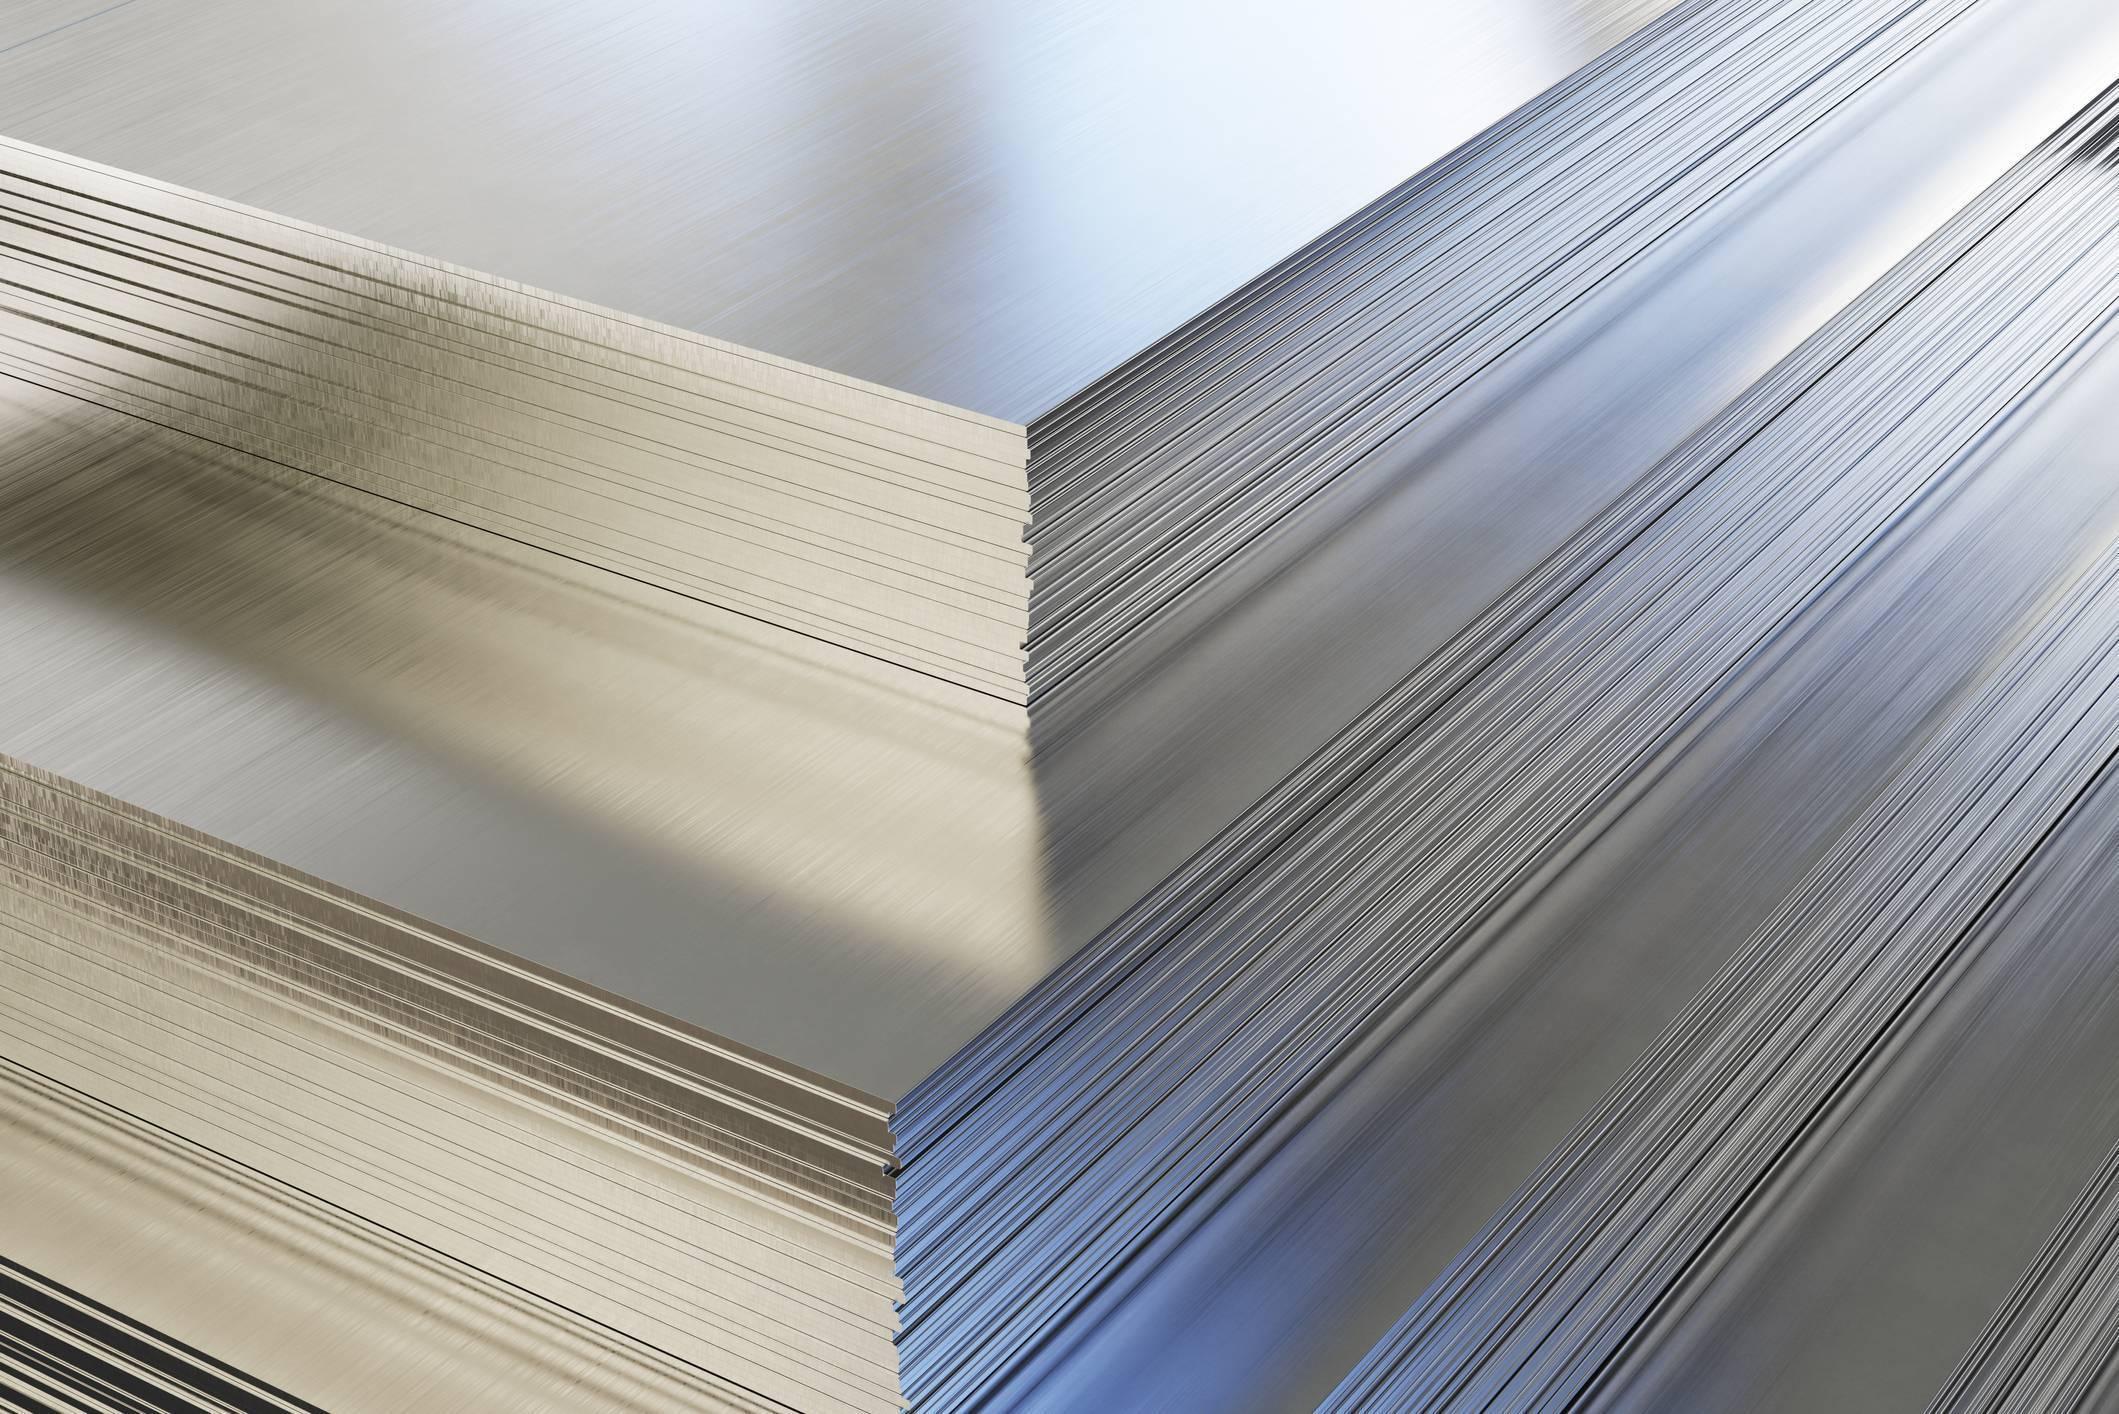 stacks of aluminum sheets